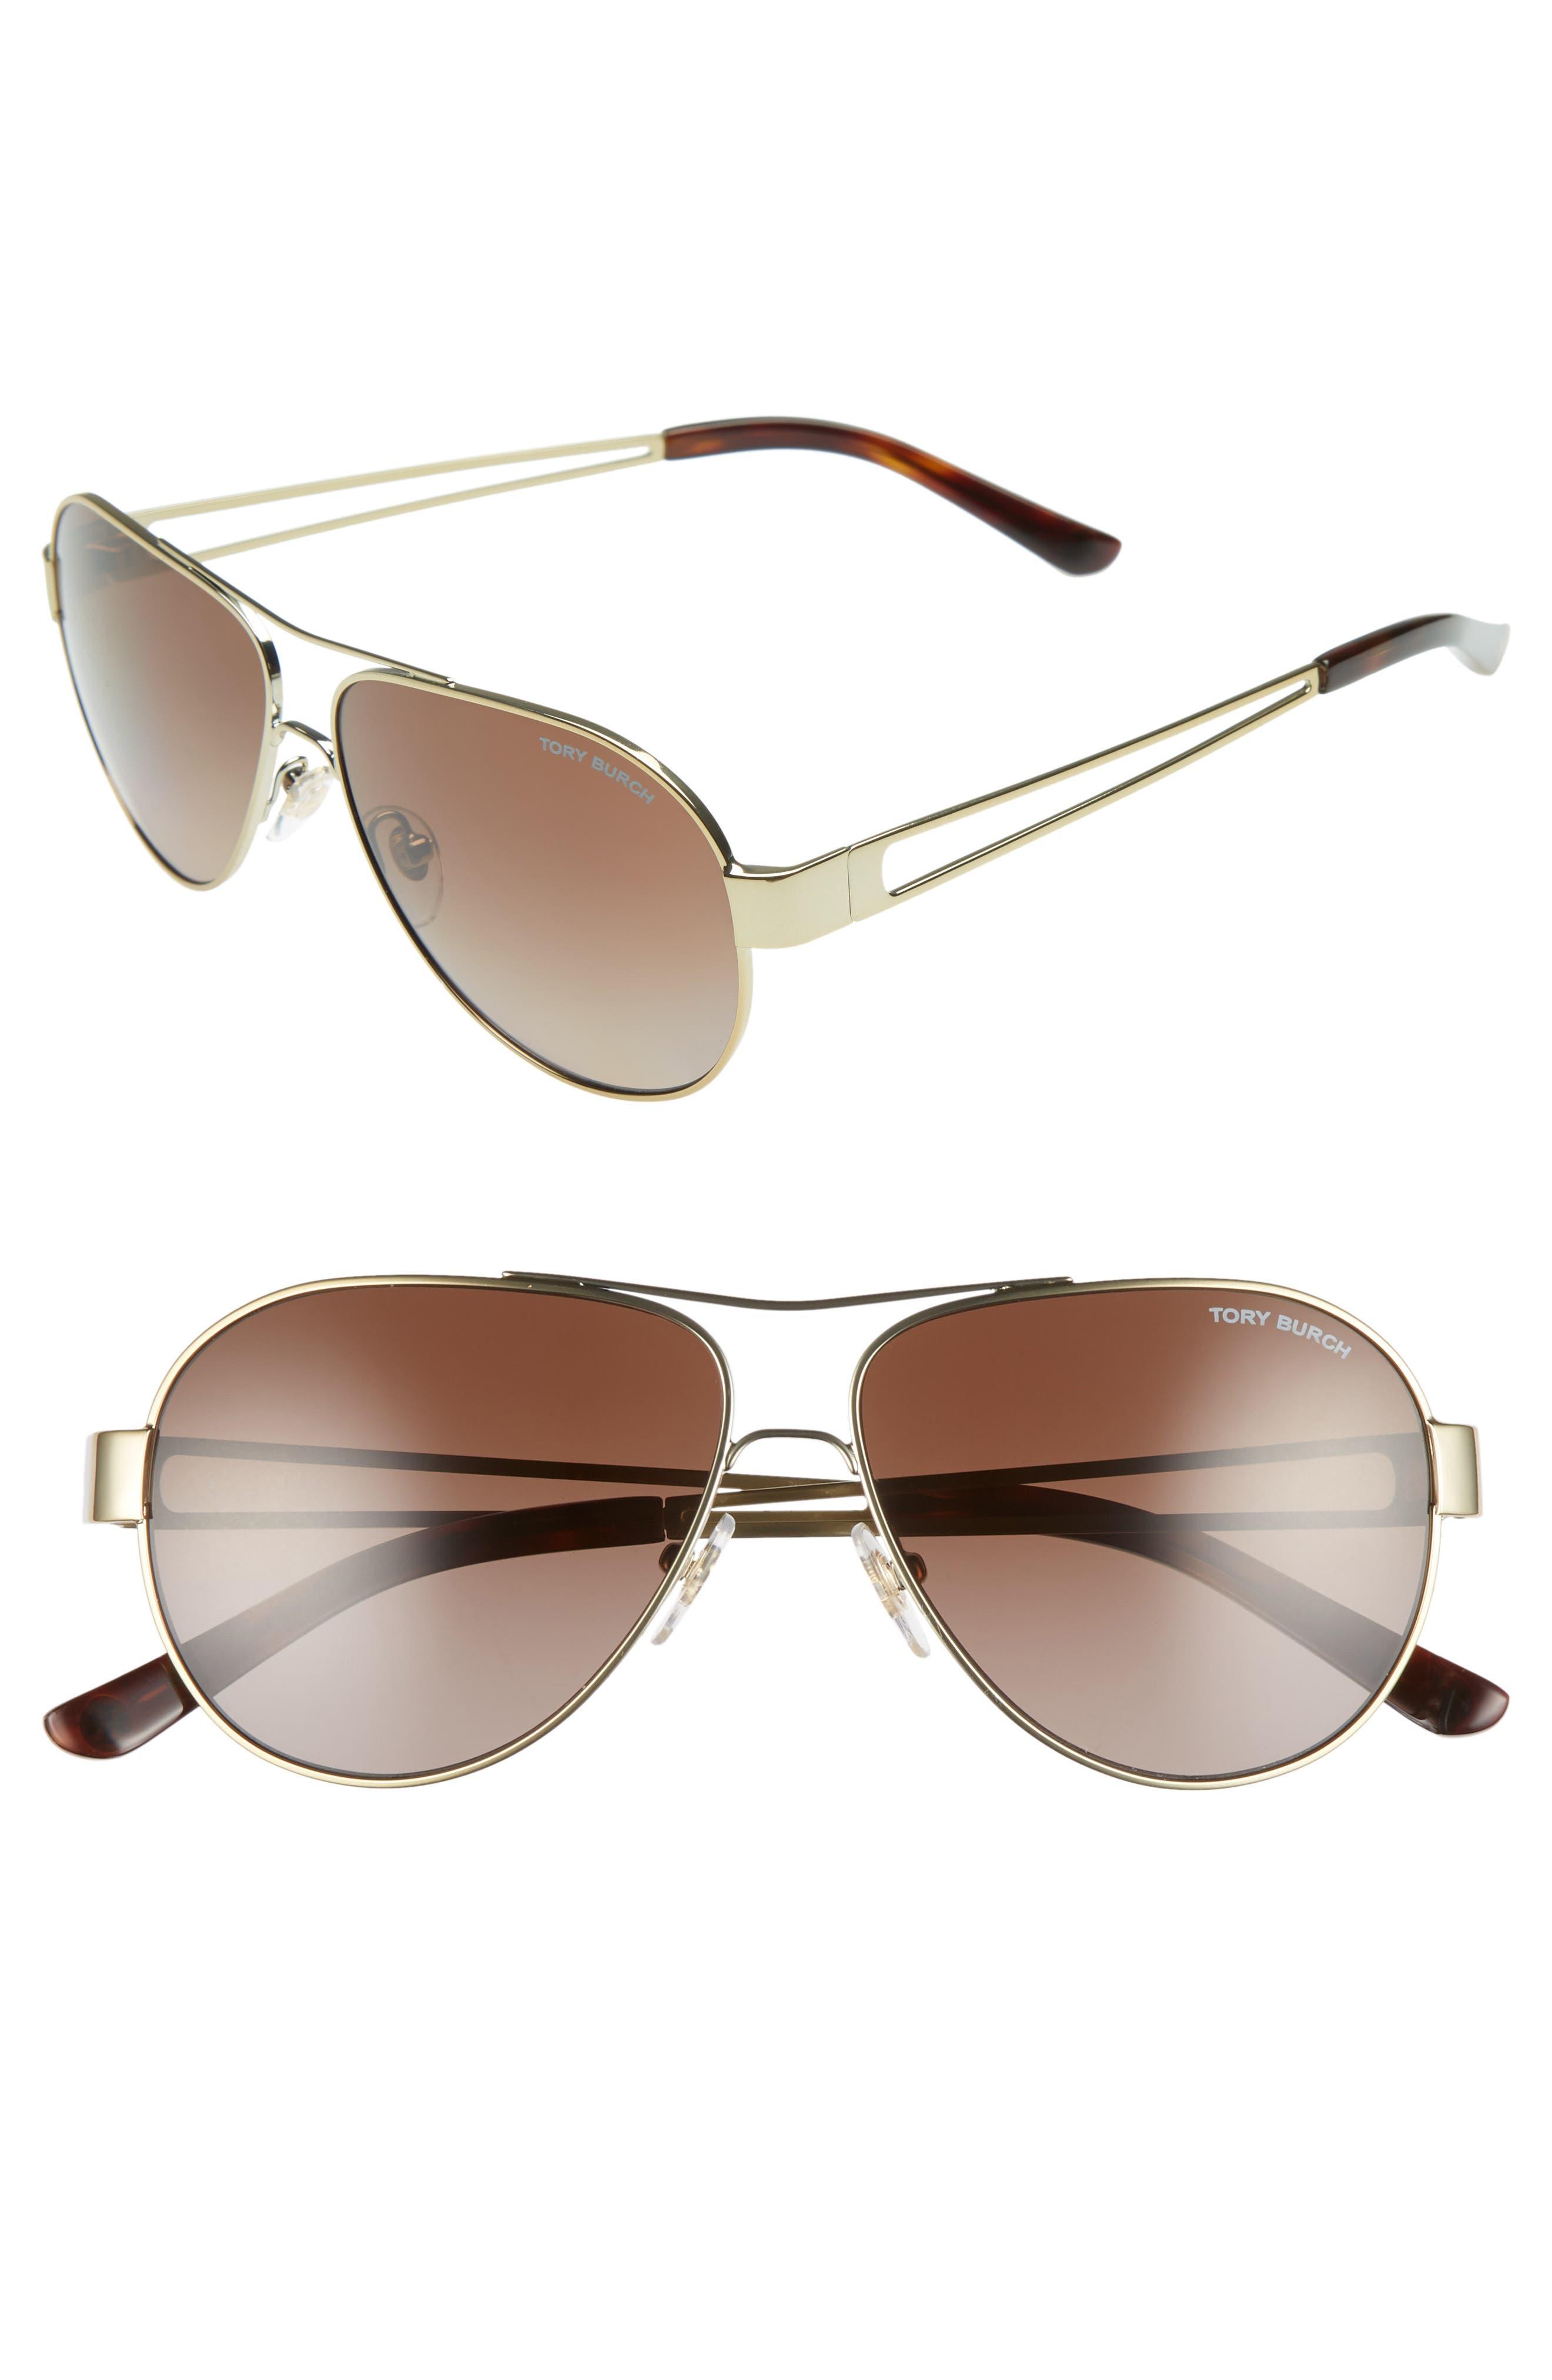 Main Image - Tory Burch 55mm Polarized Aviator Sunglasses